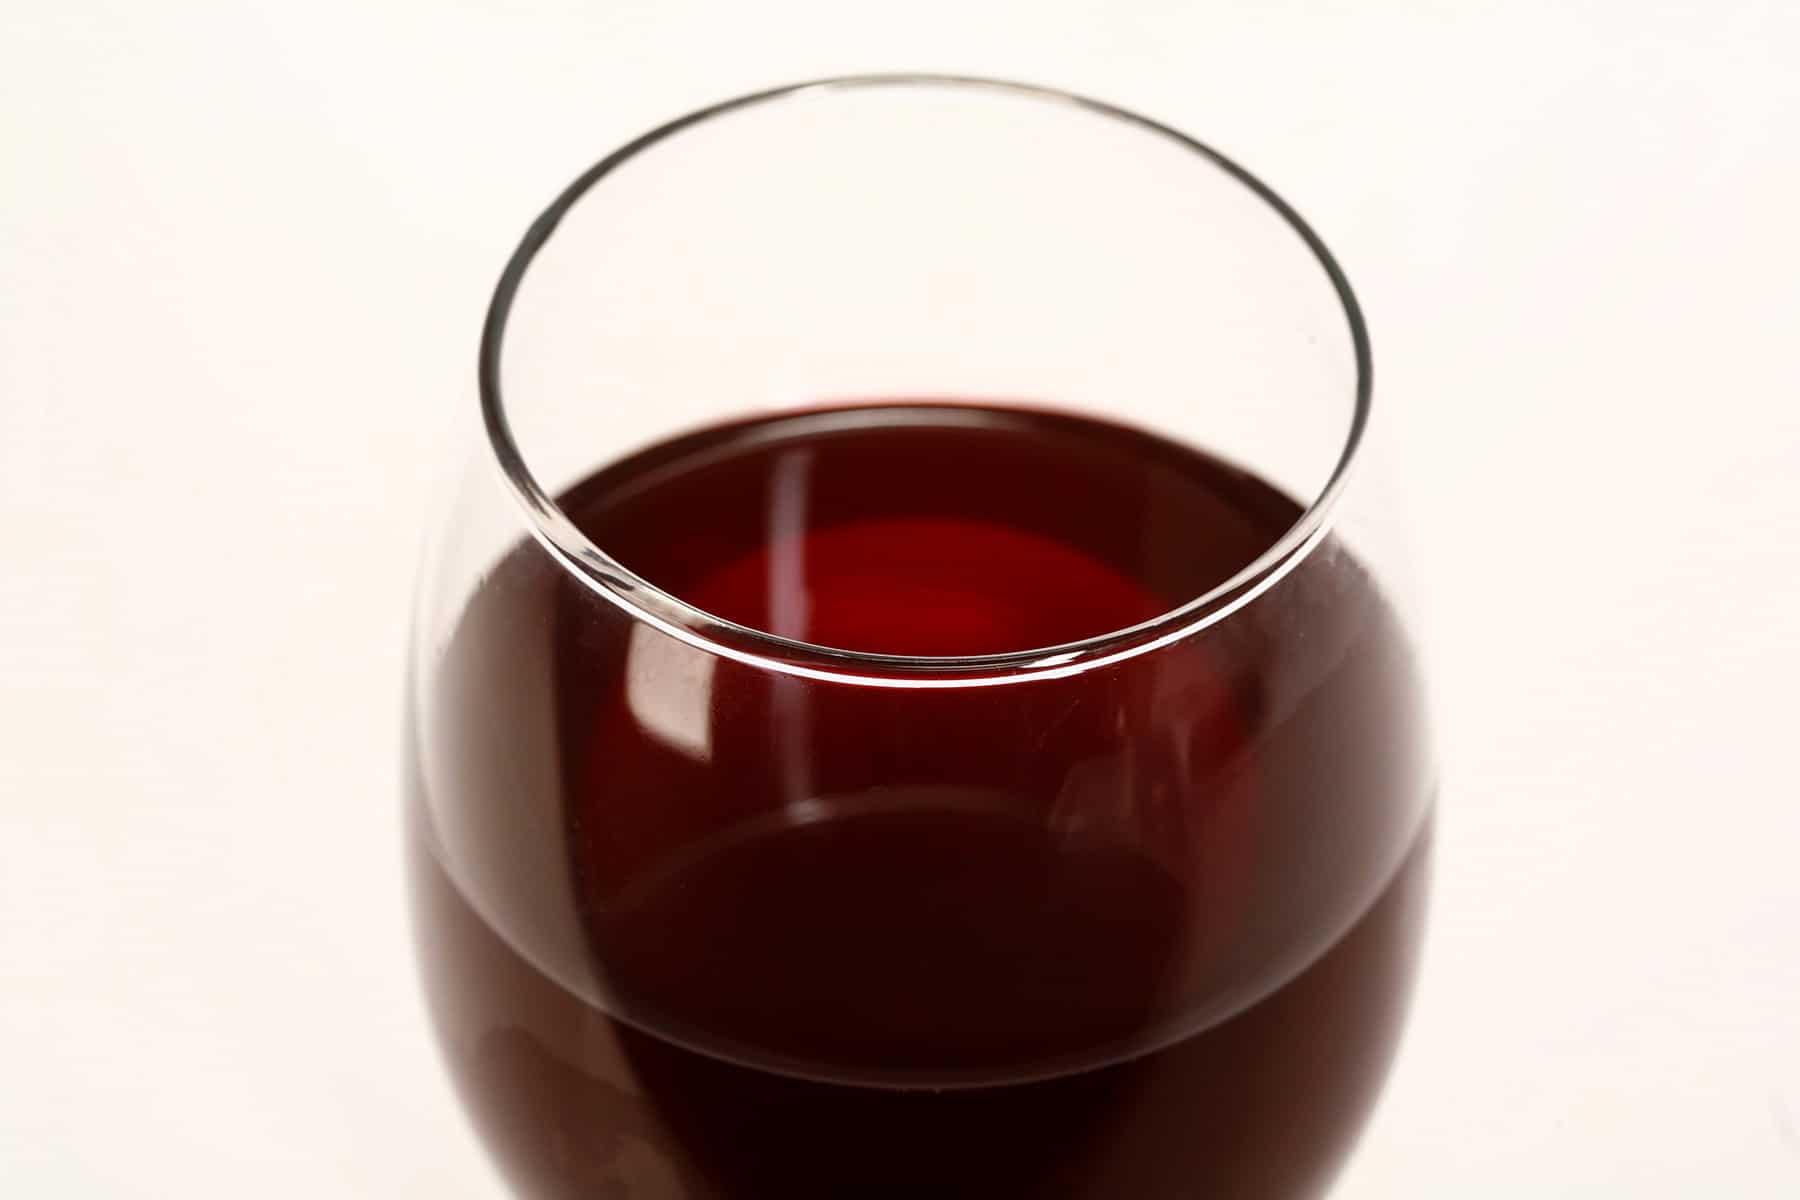 A glass of dark red cherry wine.